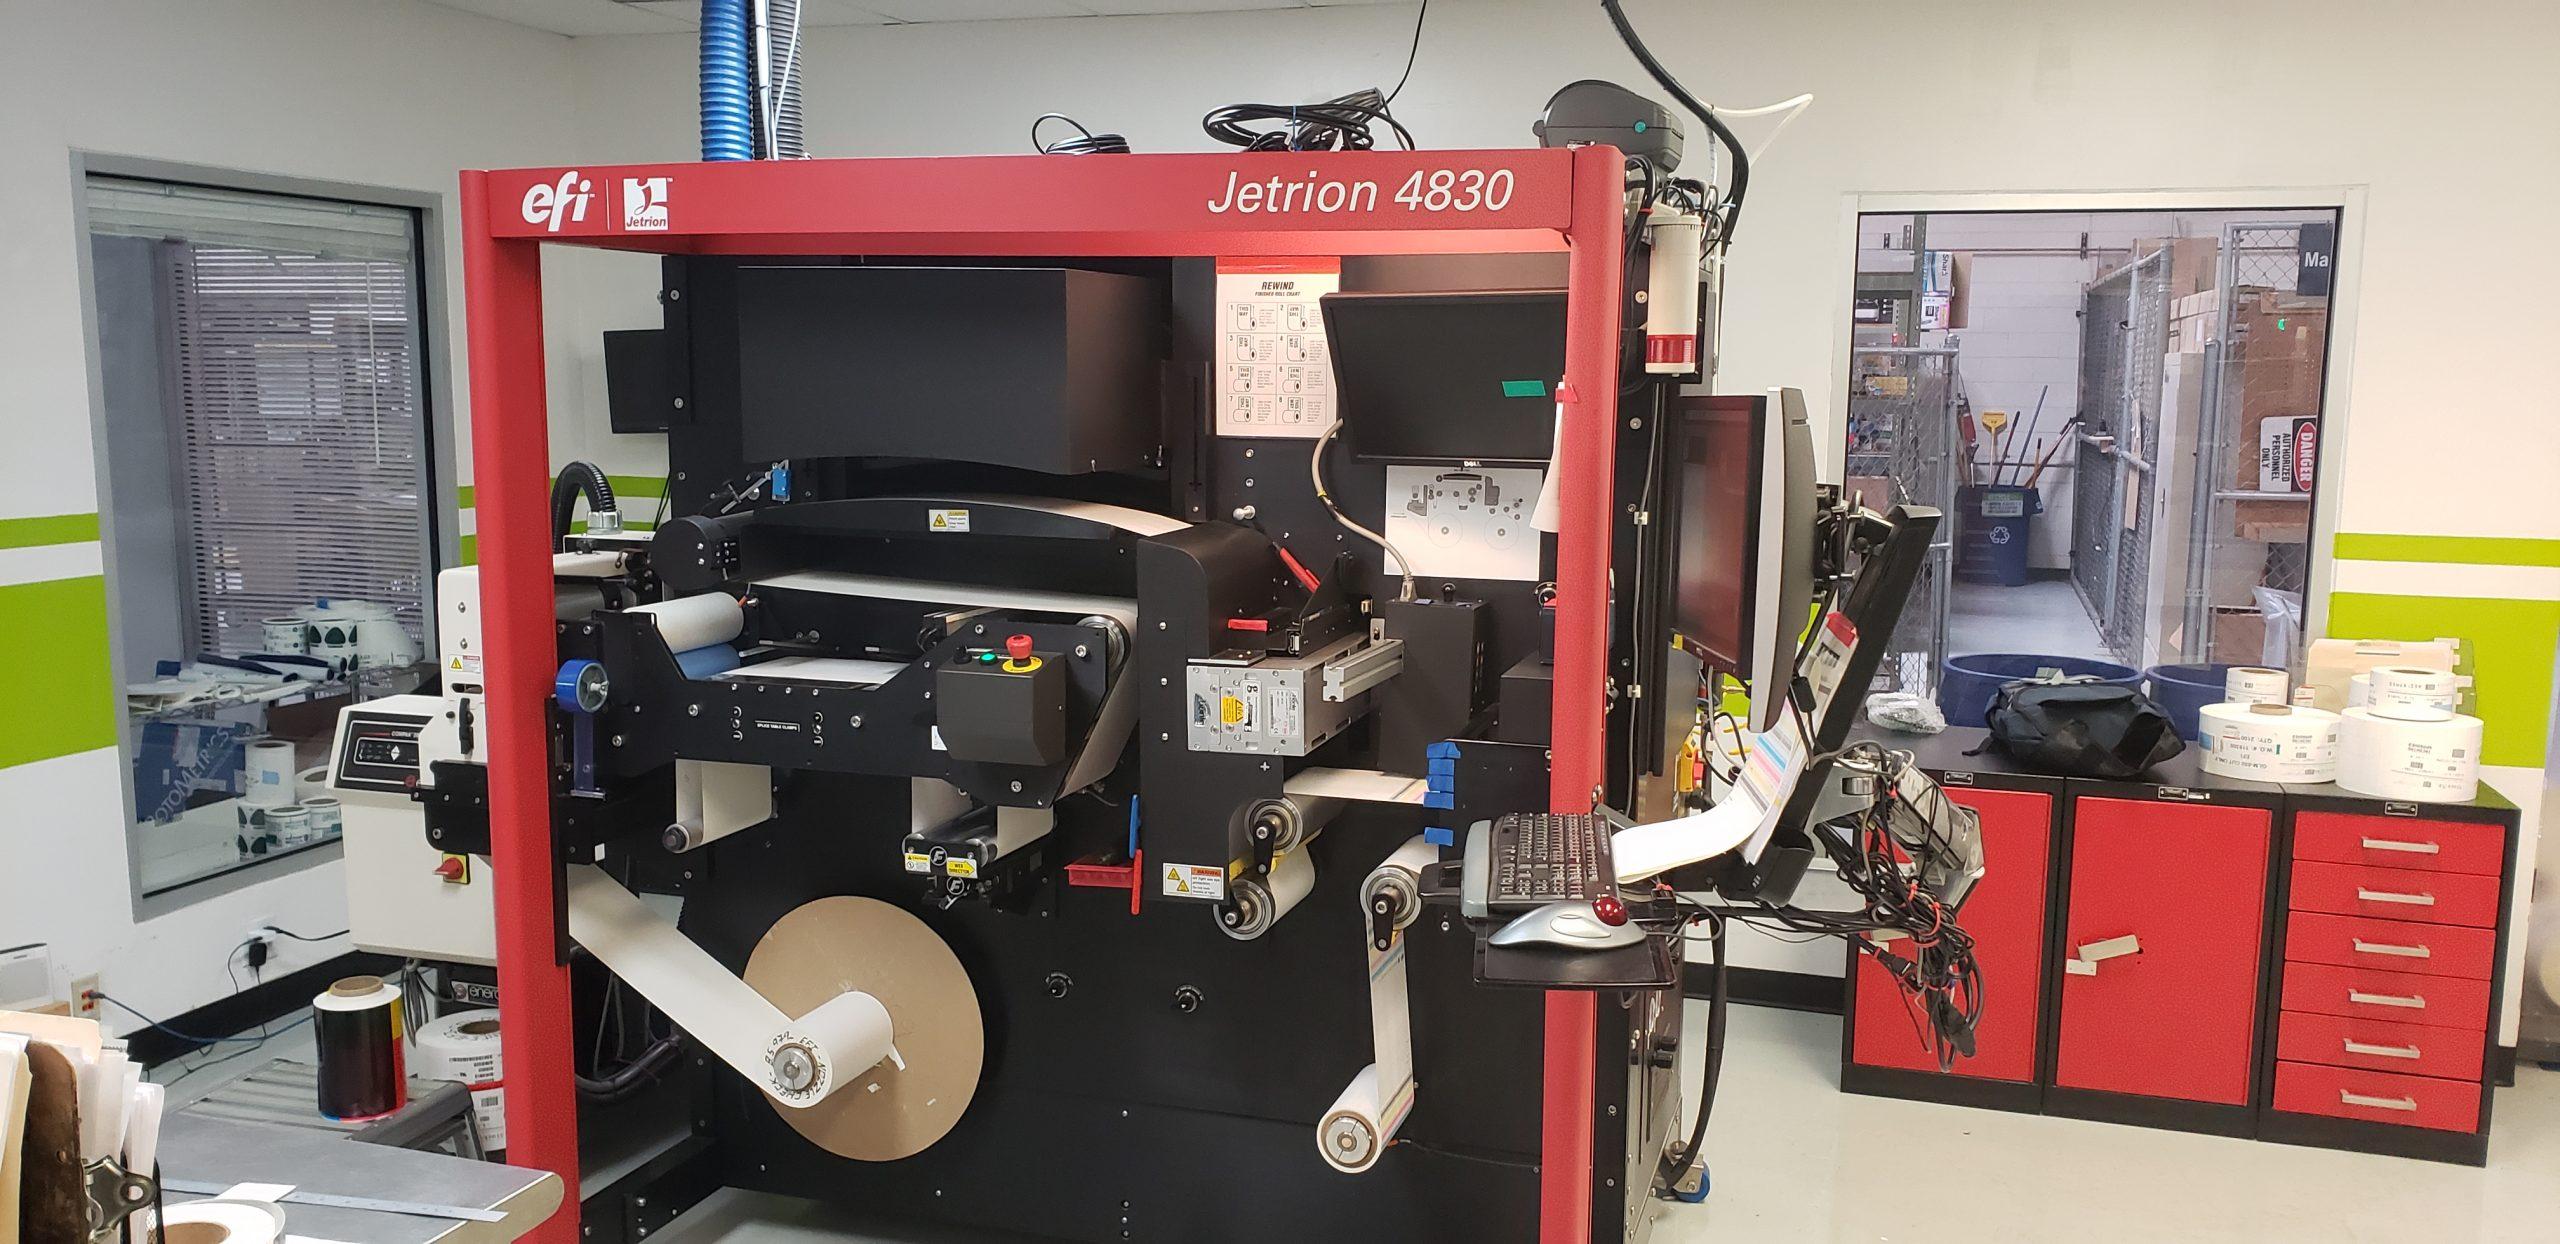 EFI Jetrion 4830 - Used Flexo Printing Presses and Used Flexographic Equipment-0